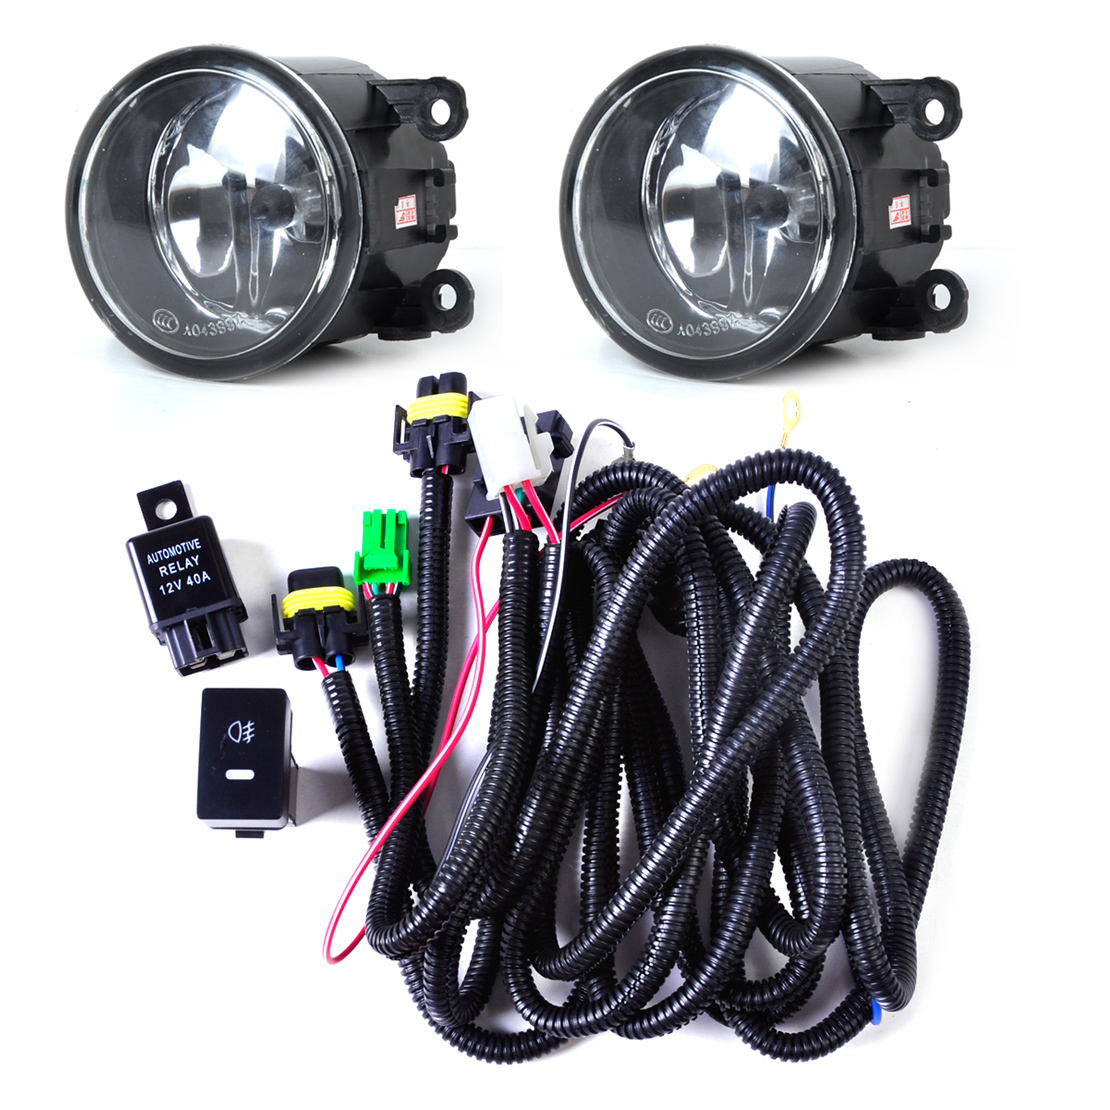 medium resolution of dwcx black wiring harness sockets switch 2 fog lights h11 lamp 12v 55w kit